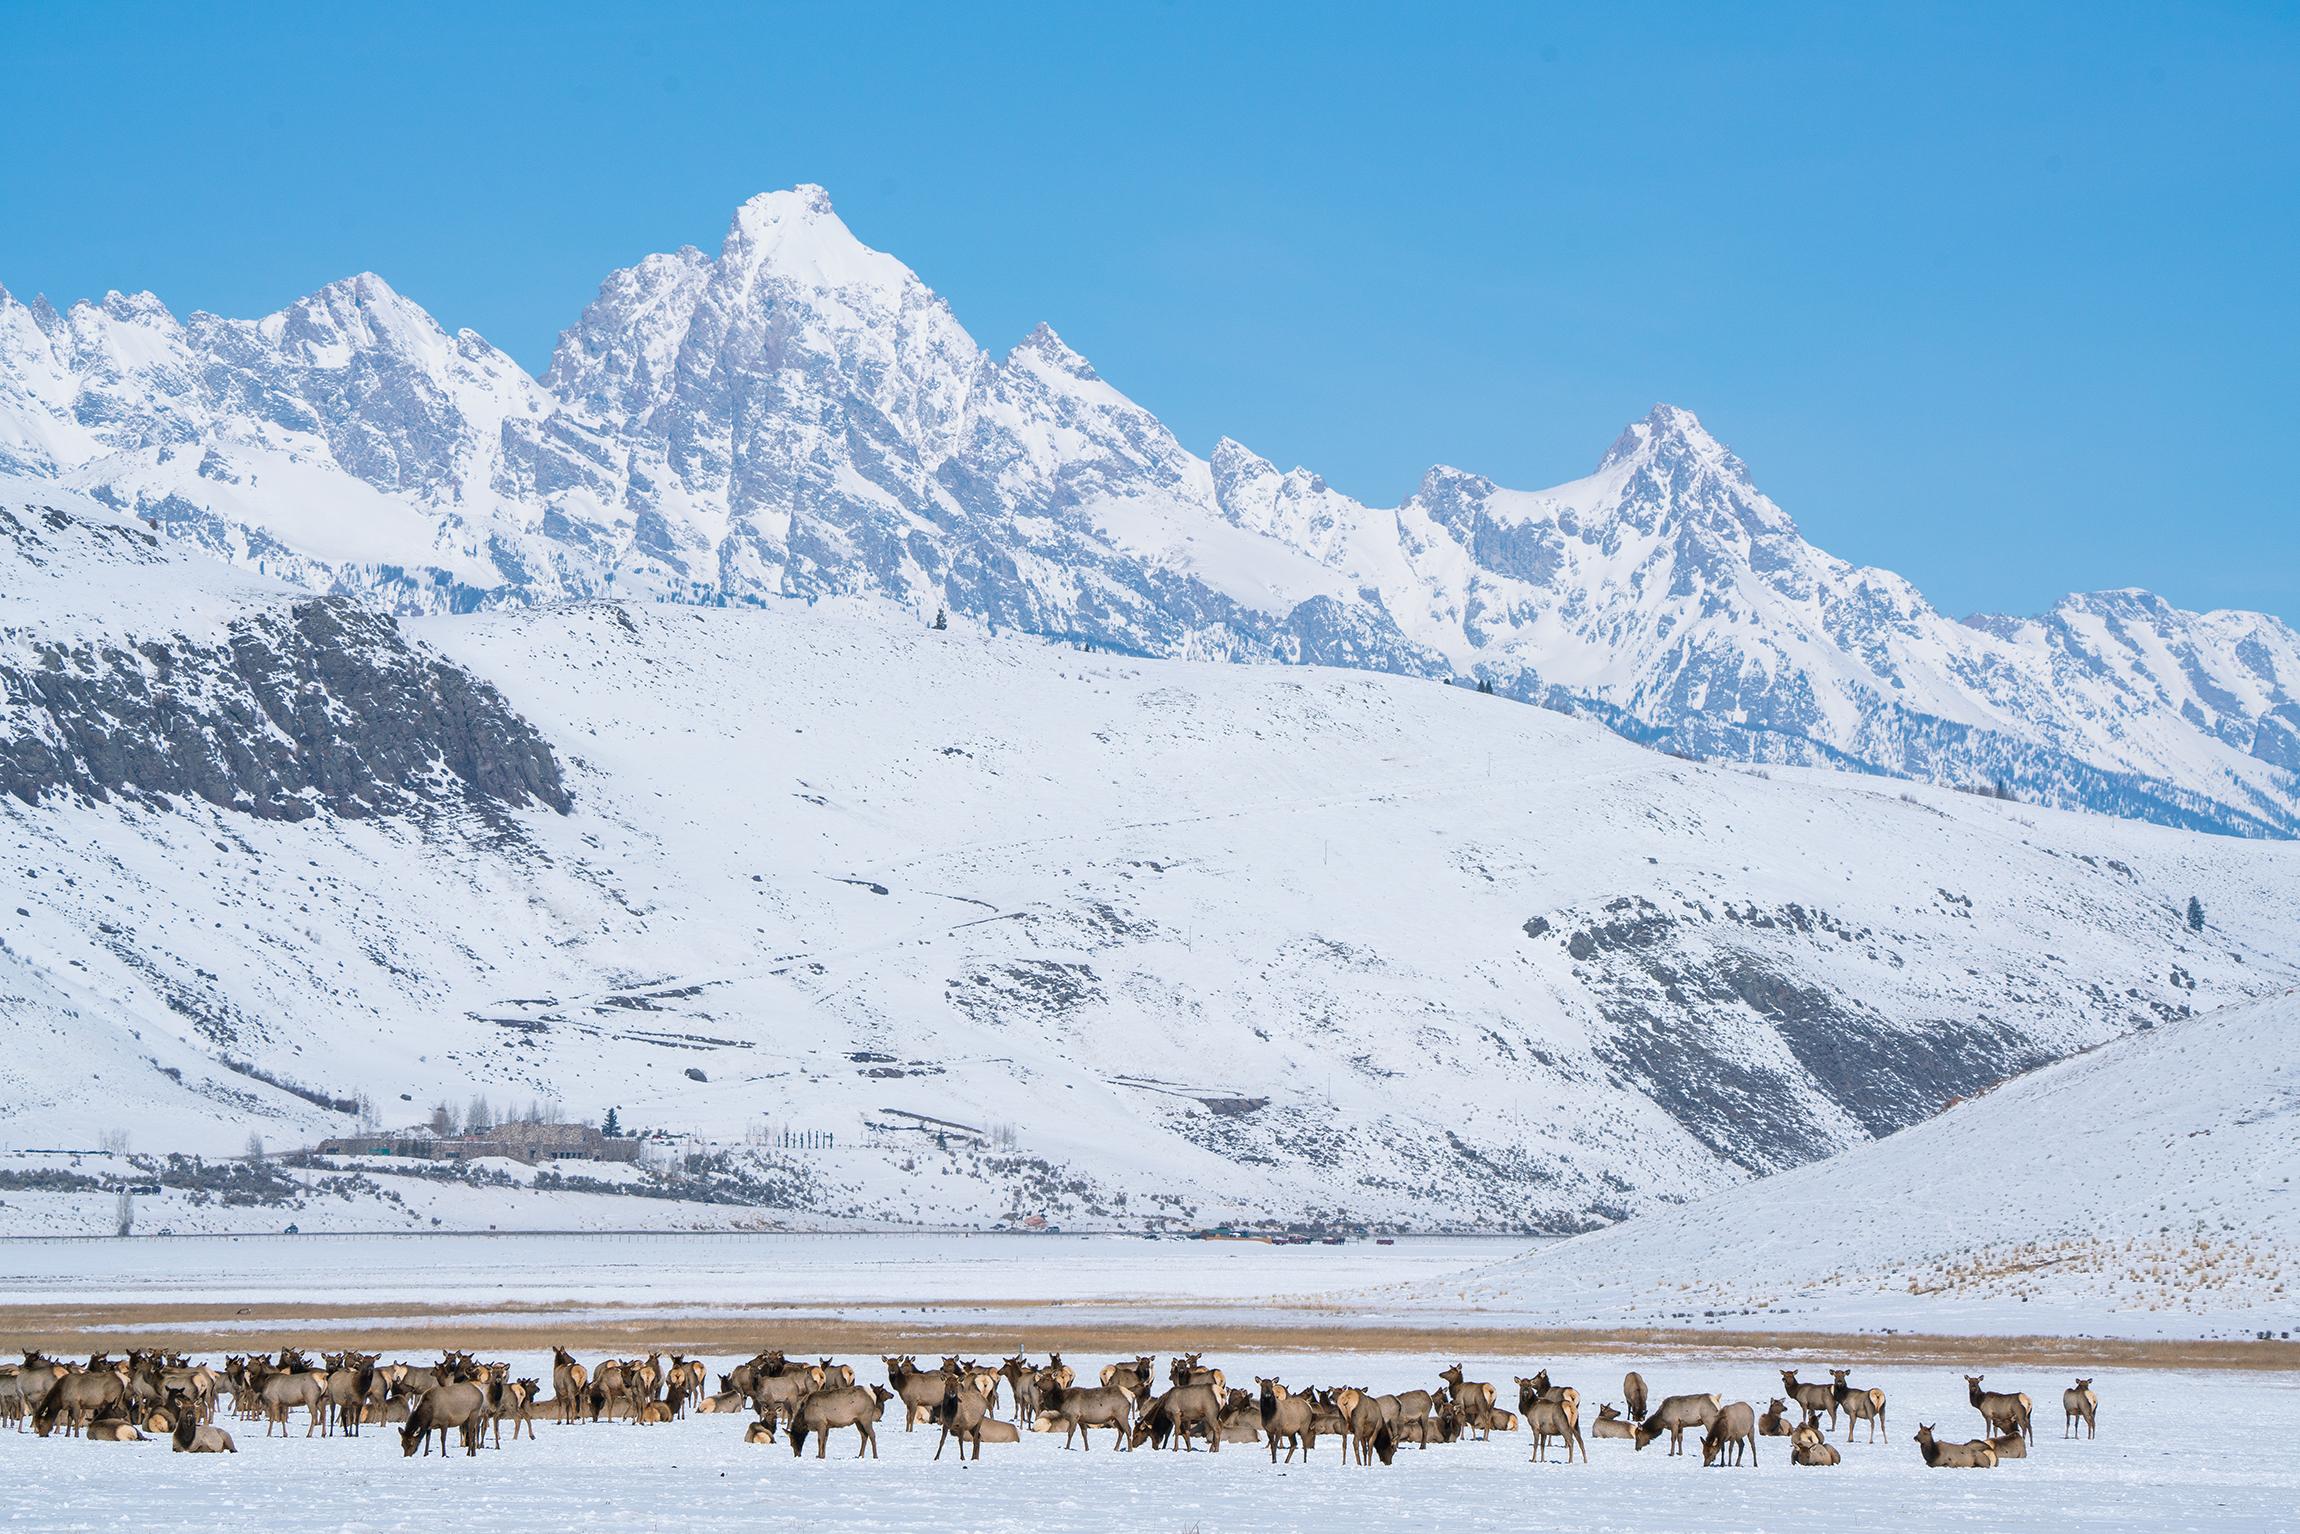 #elk, #snow, #mountains, #herd, #sanctuary, #wildlife, #predators, #safe, #naature, #naturephotography, #grandtetonnationalpark, #jacksonhole